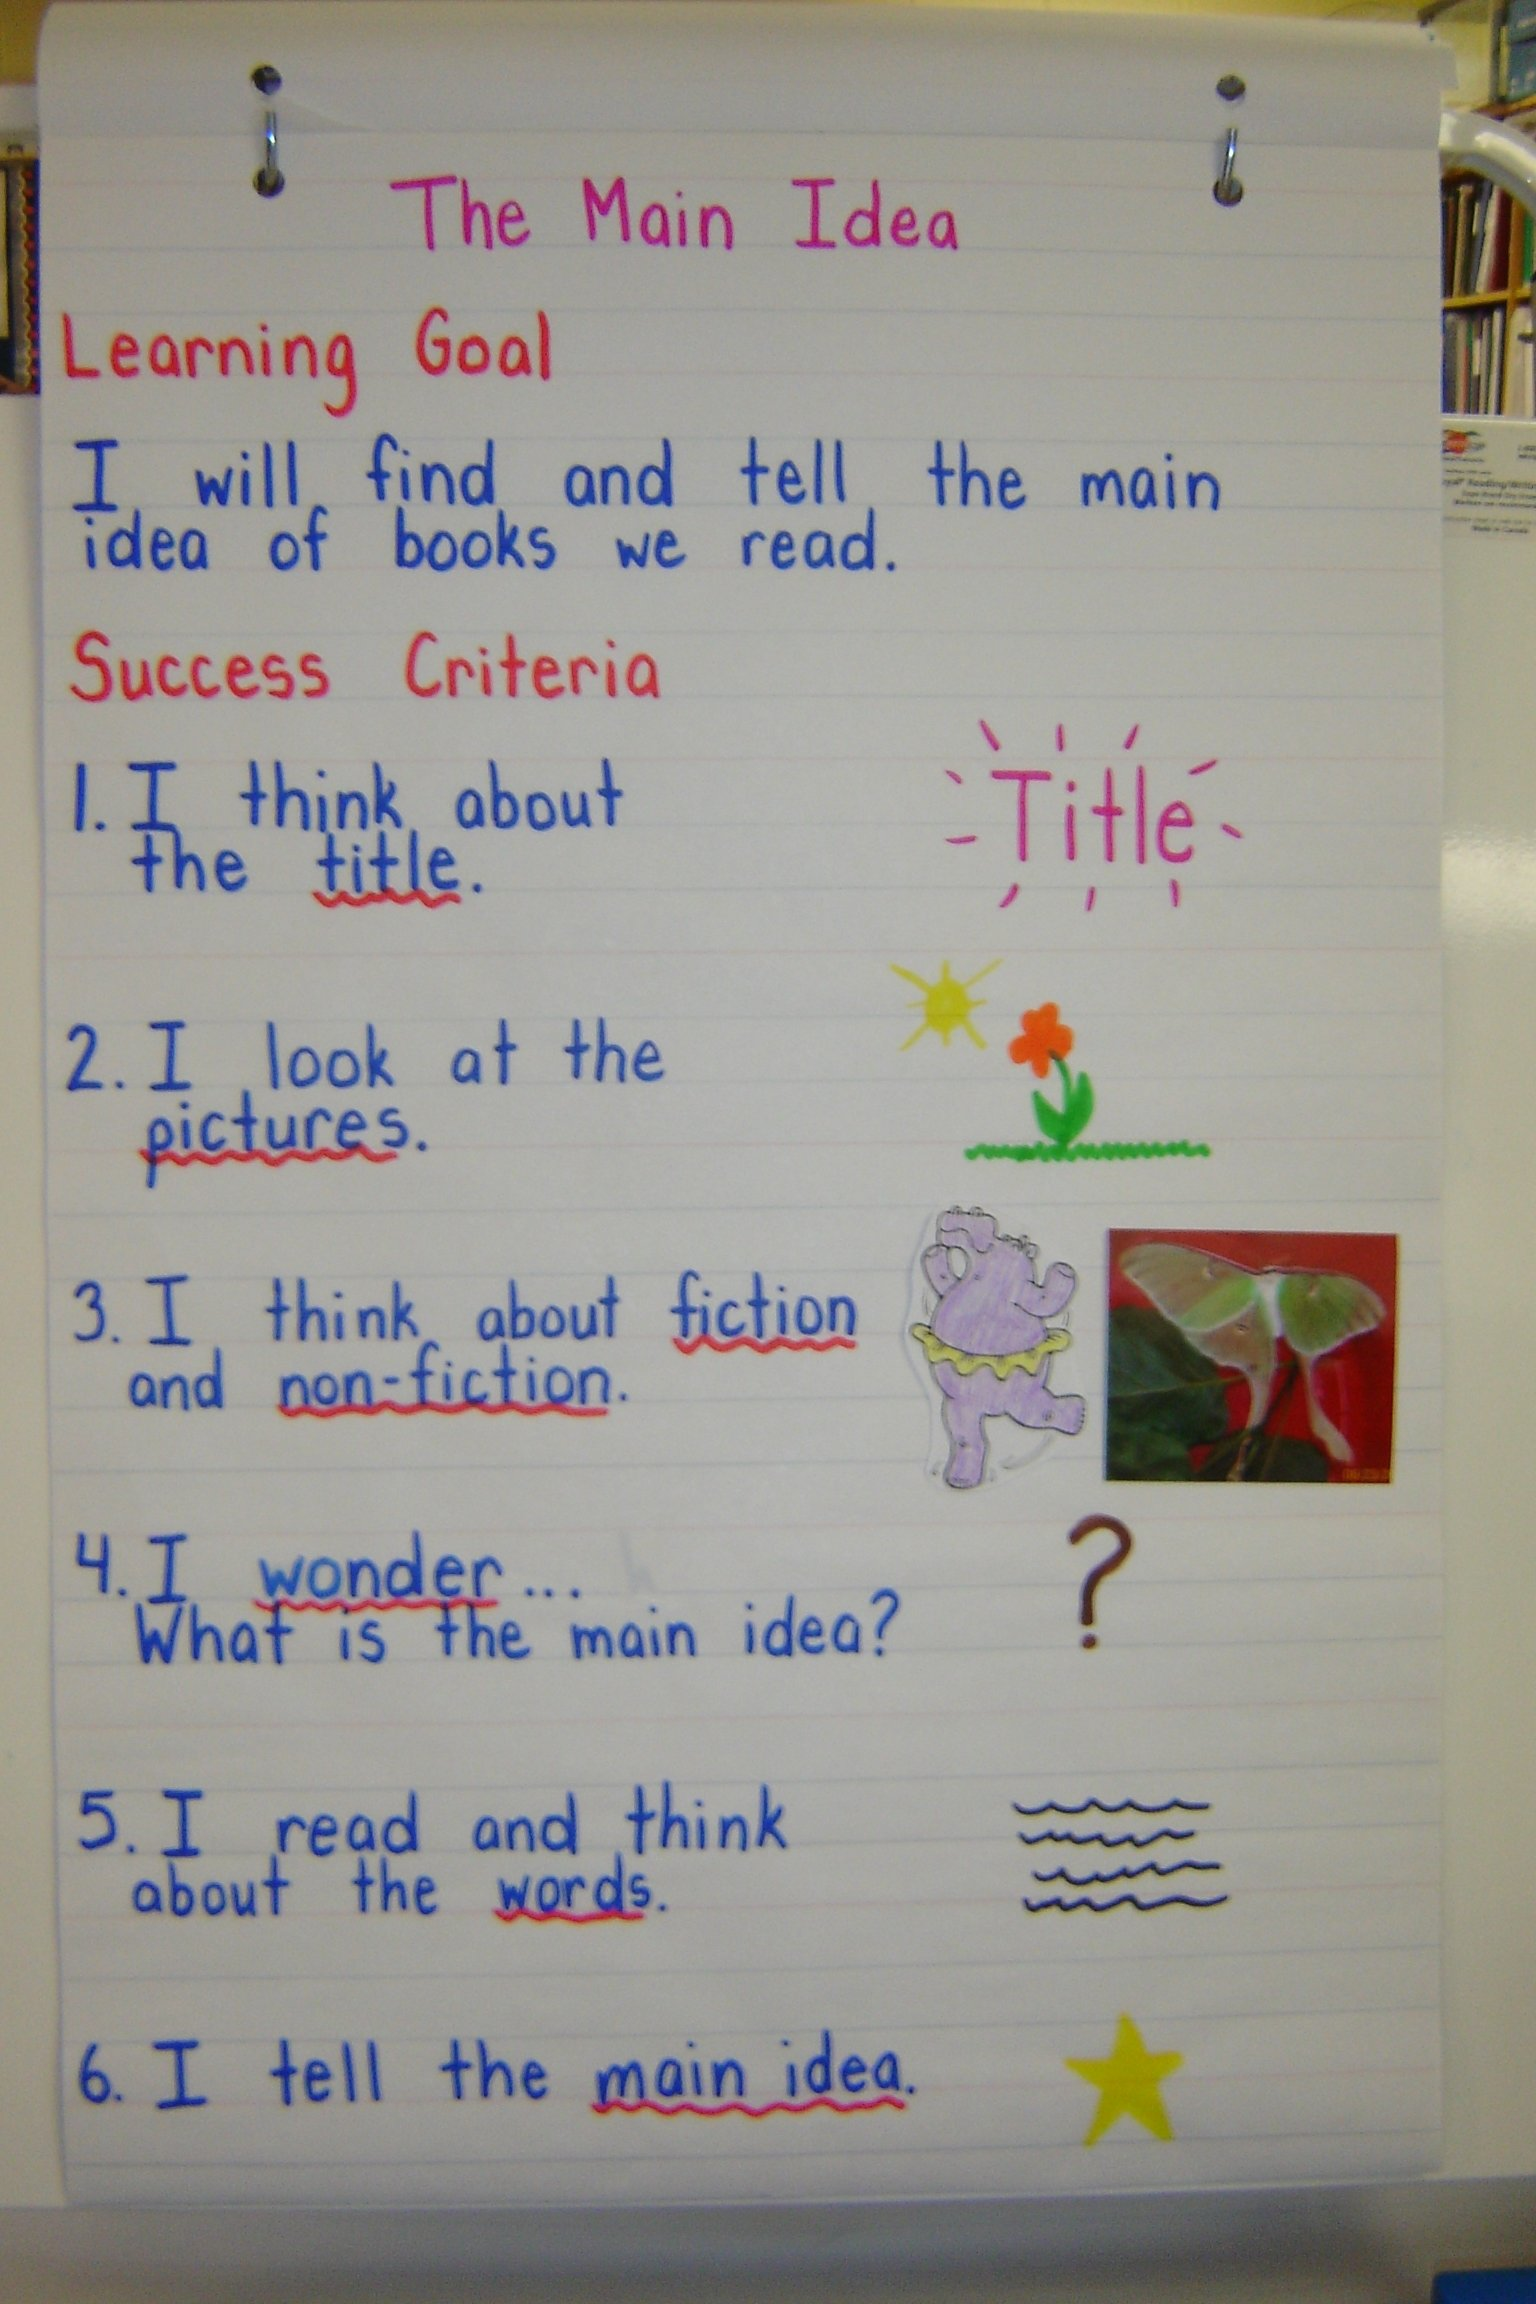 10 Cute What Is The Main Idea Of A Book success criteria examples google search main idea determining 2021